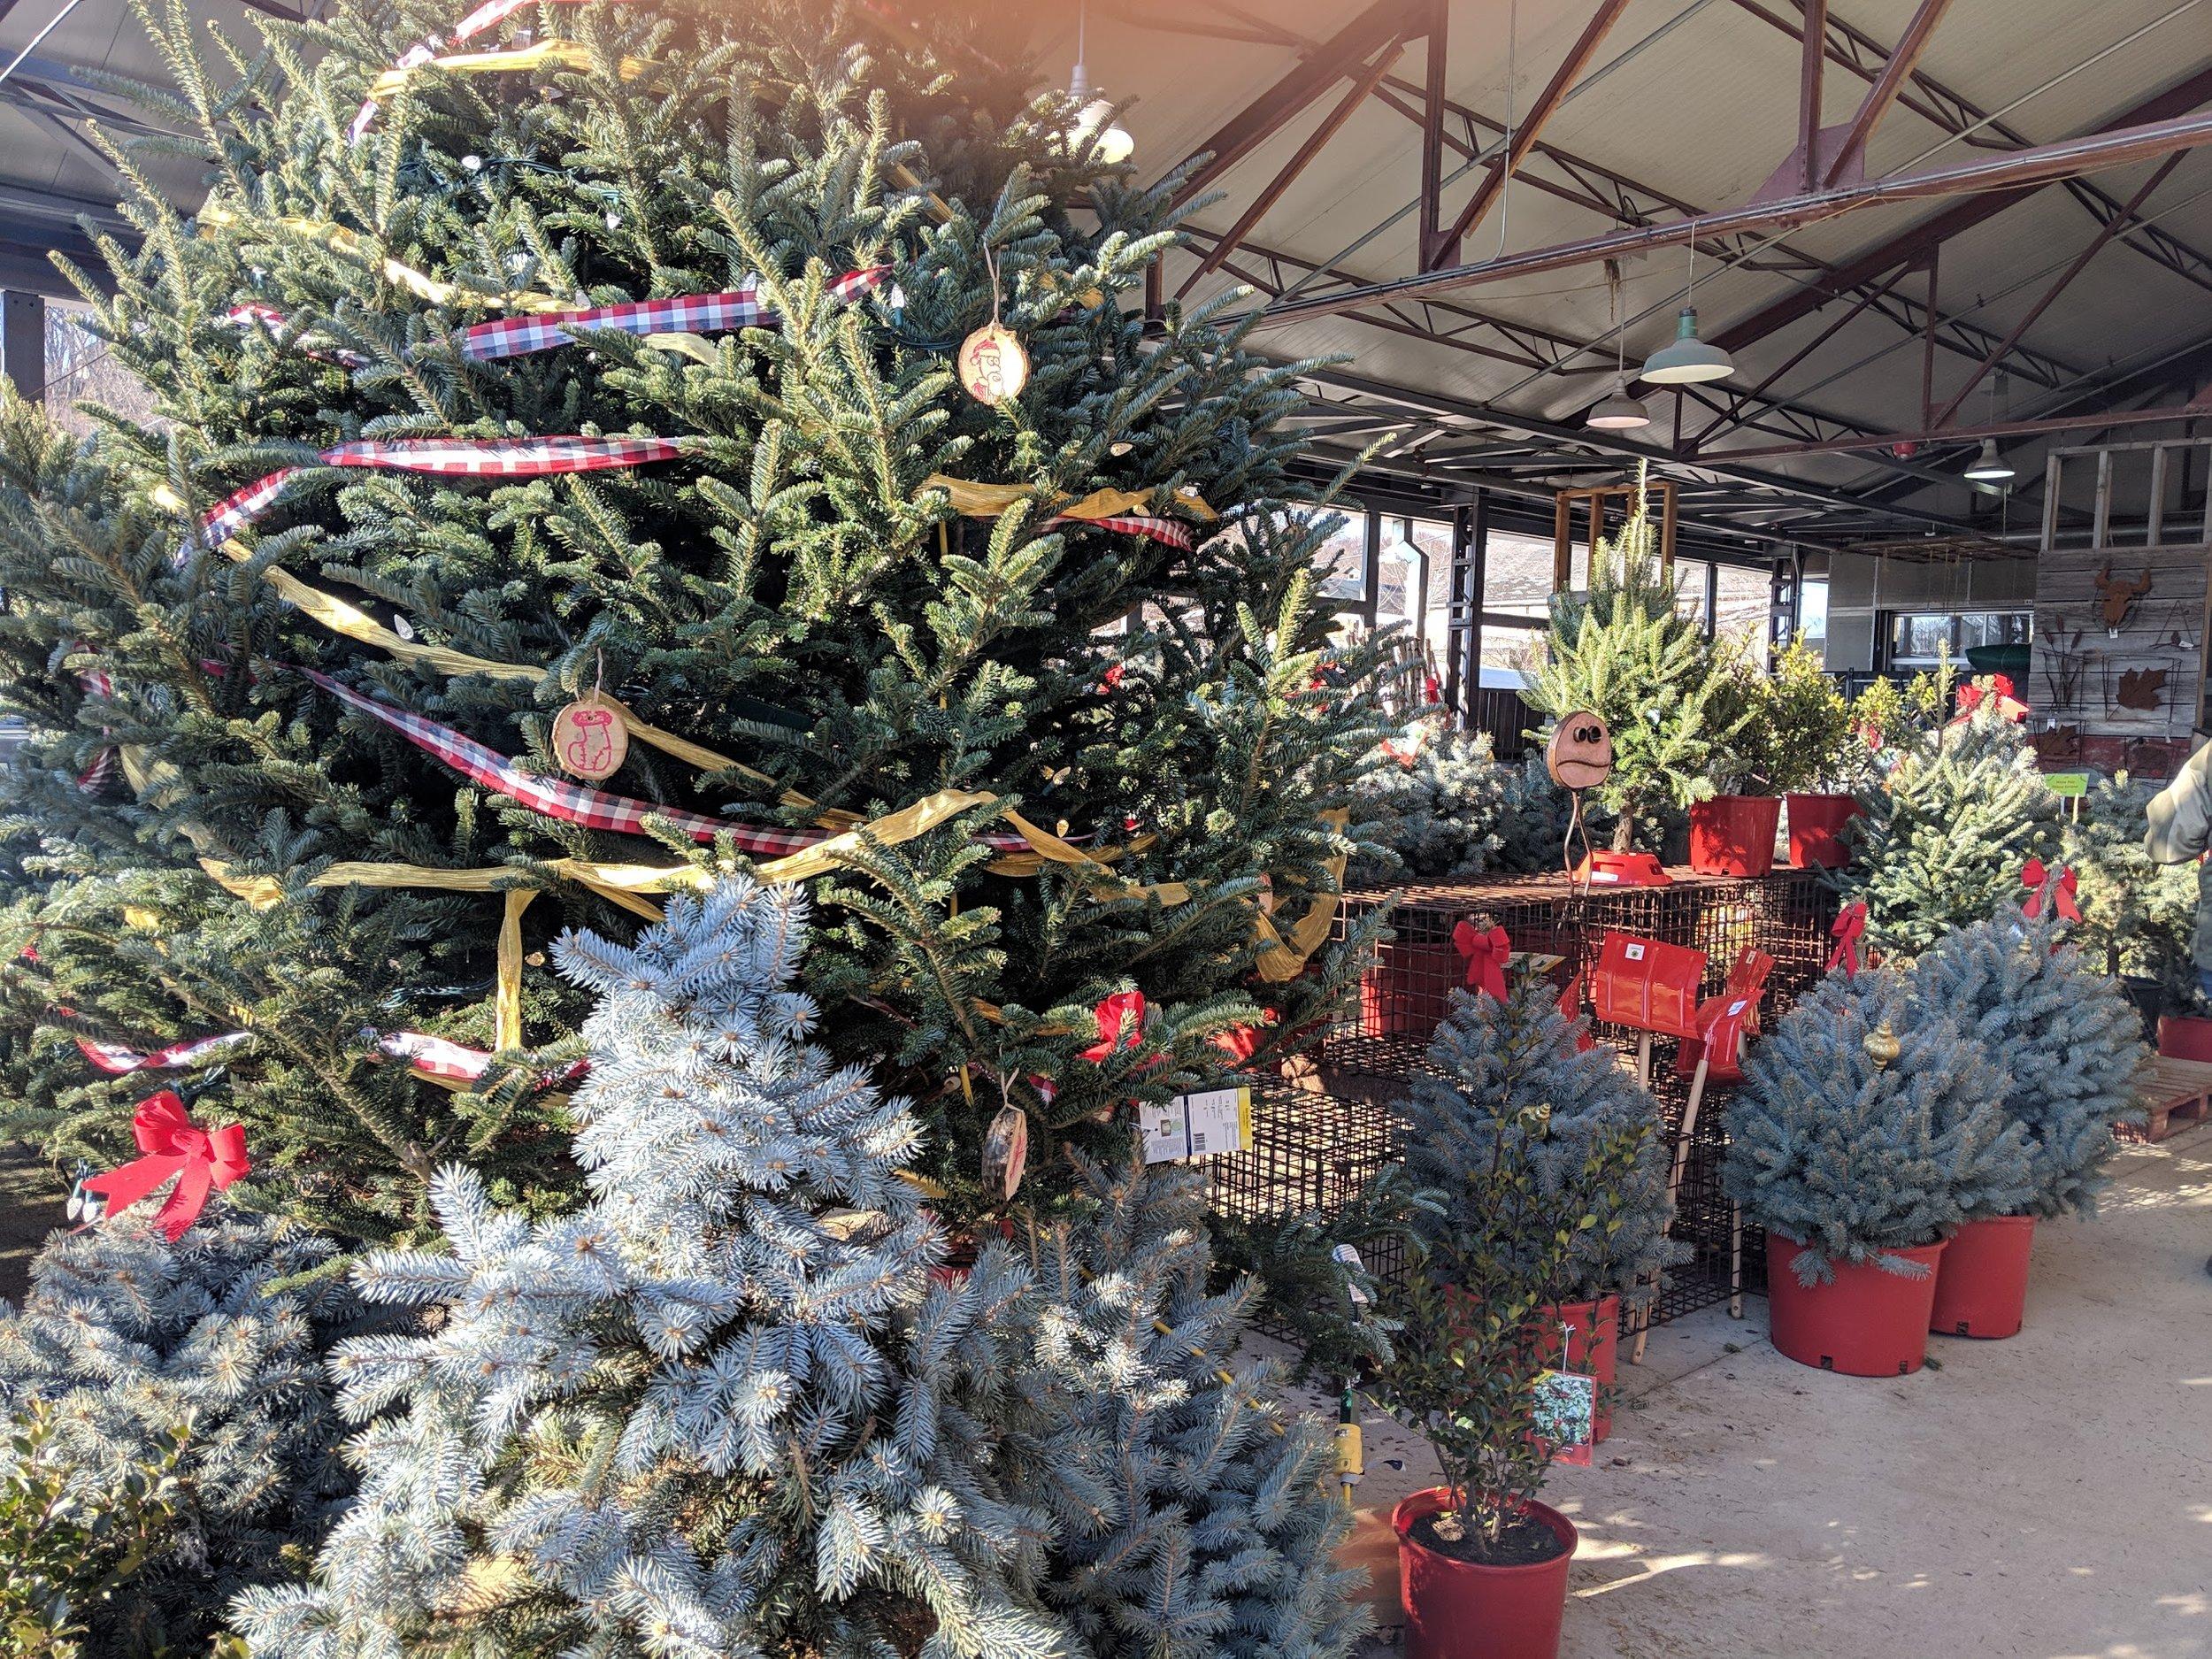 Christmas-tree-shopping-Green-Market-Toronto-Winter-Village-Toronto-family-lifestyle-photographer.jpg